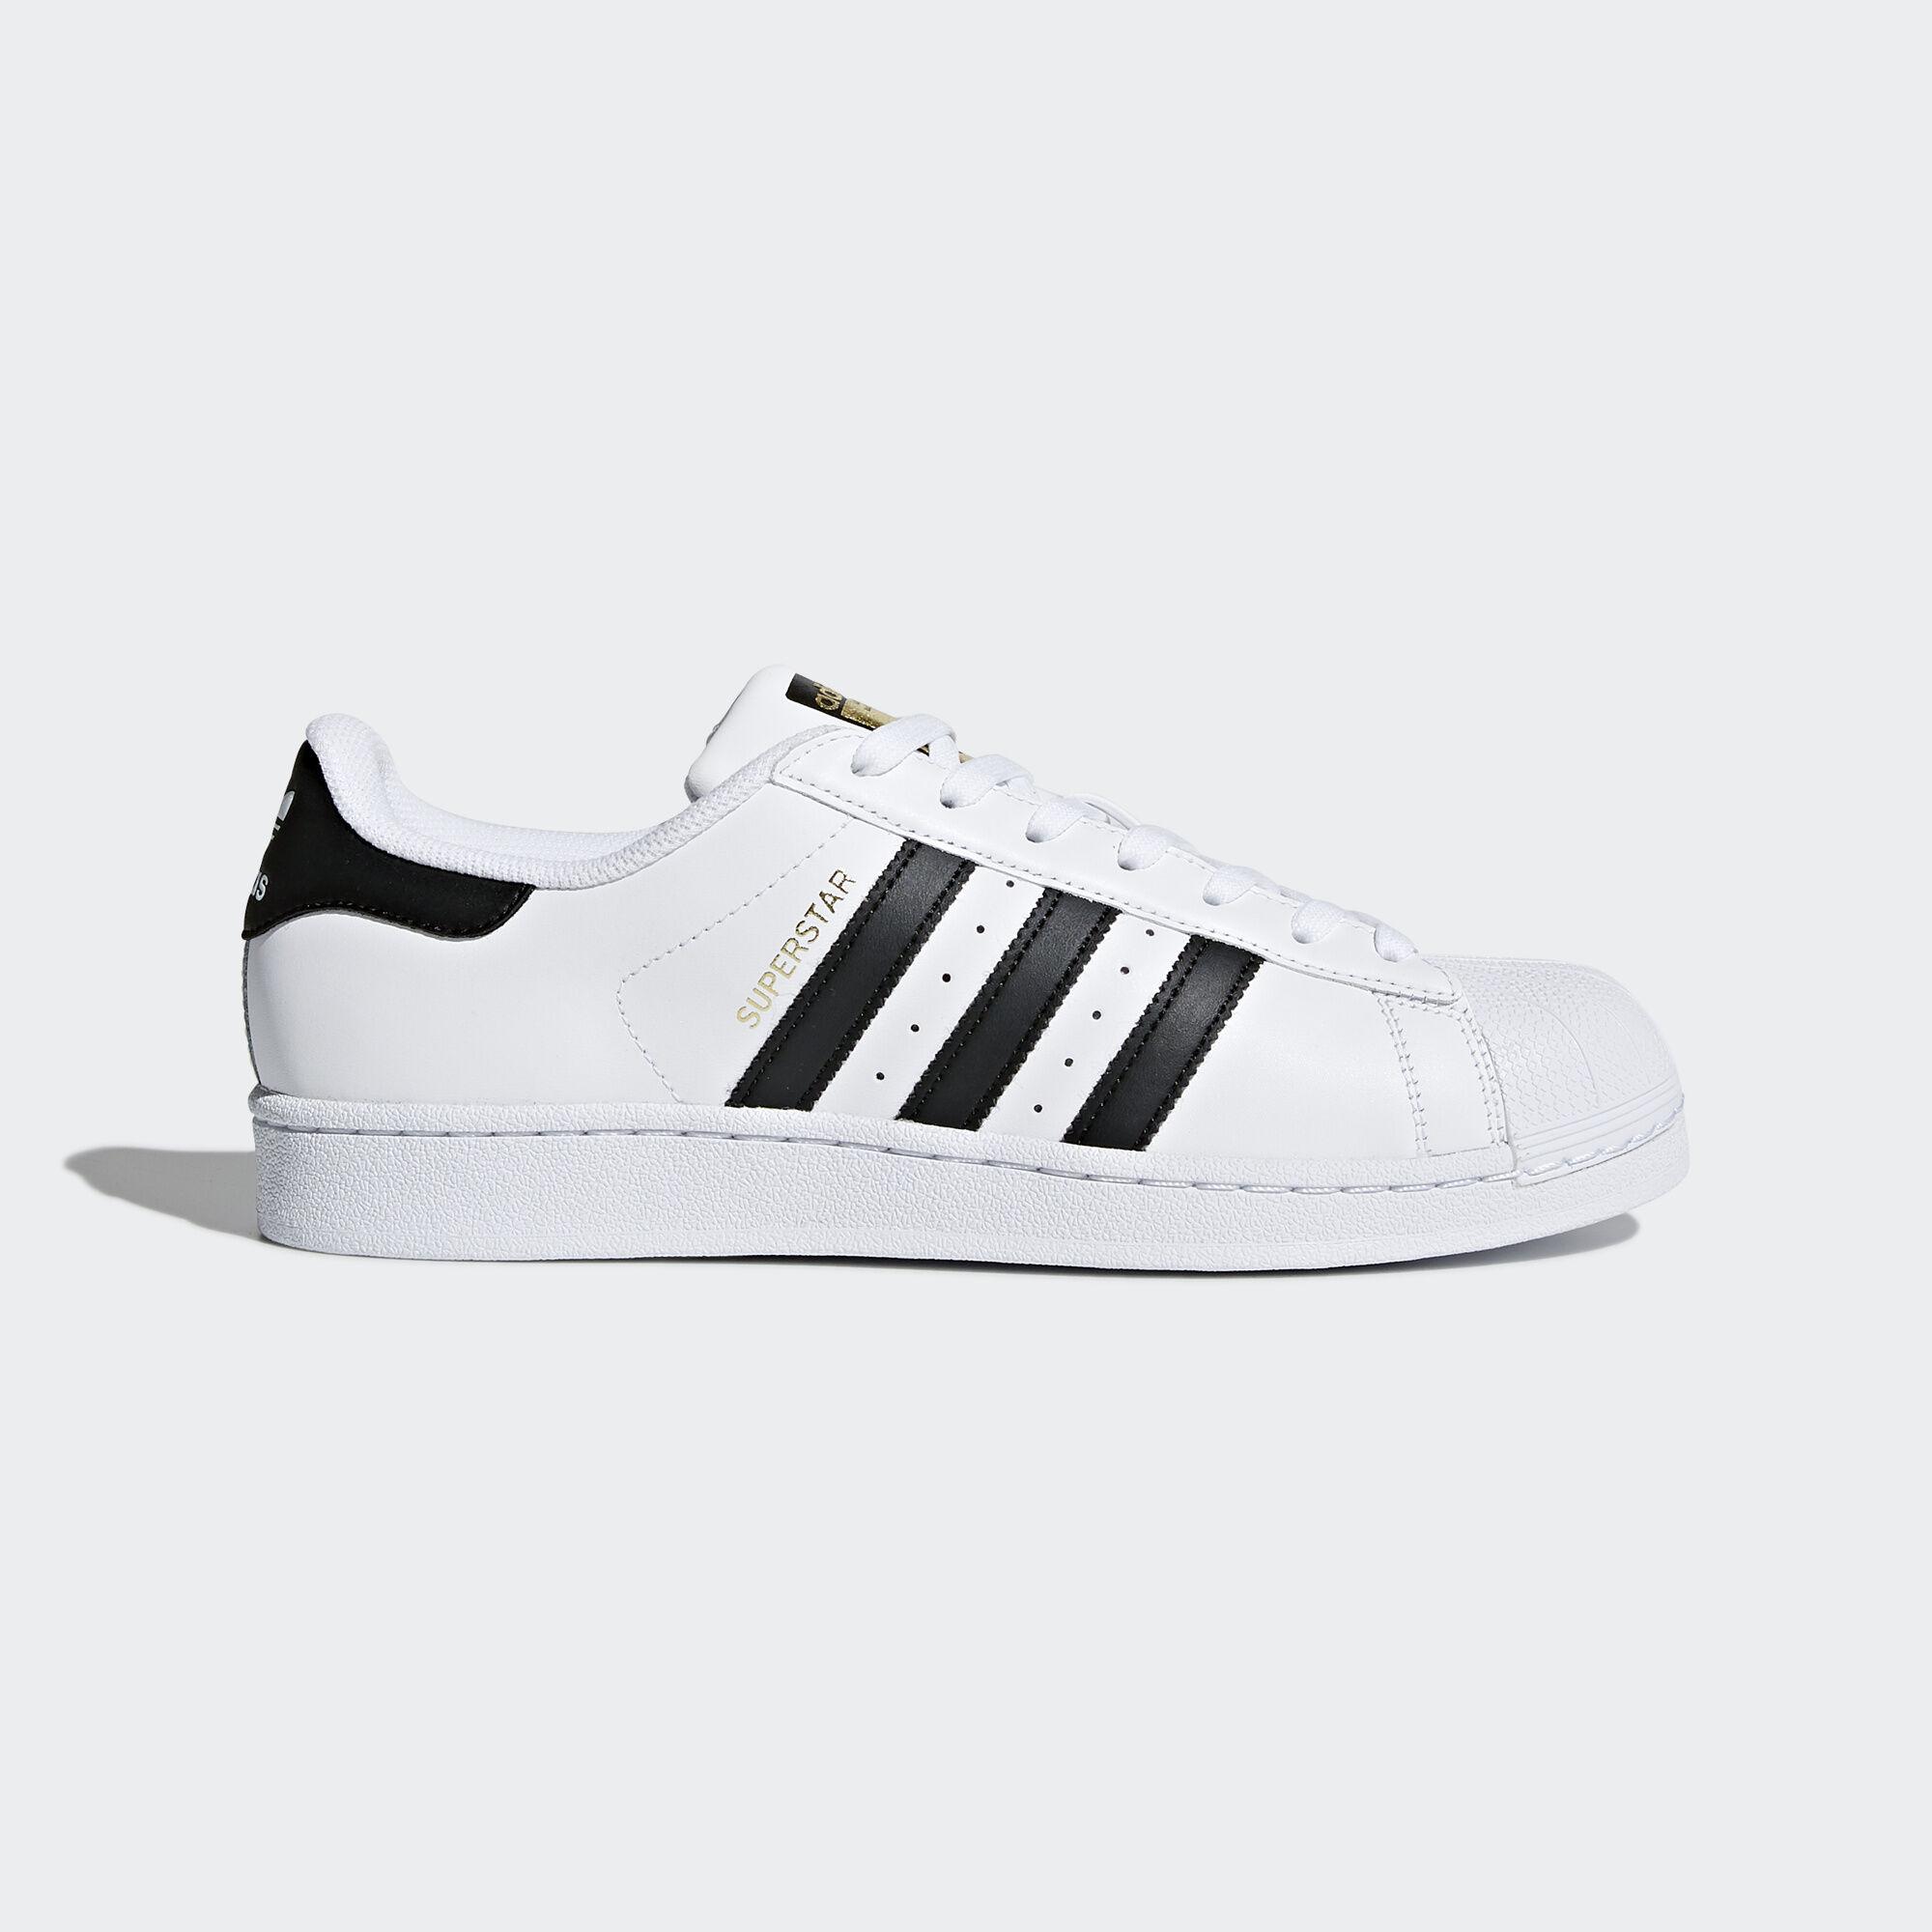 hkymj adidas Superstar Shoes - White | adidas US